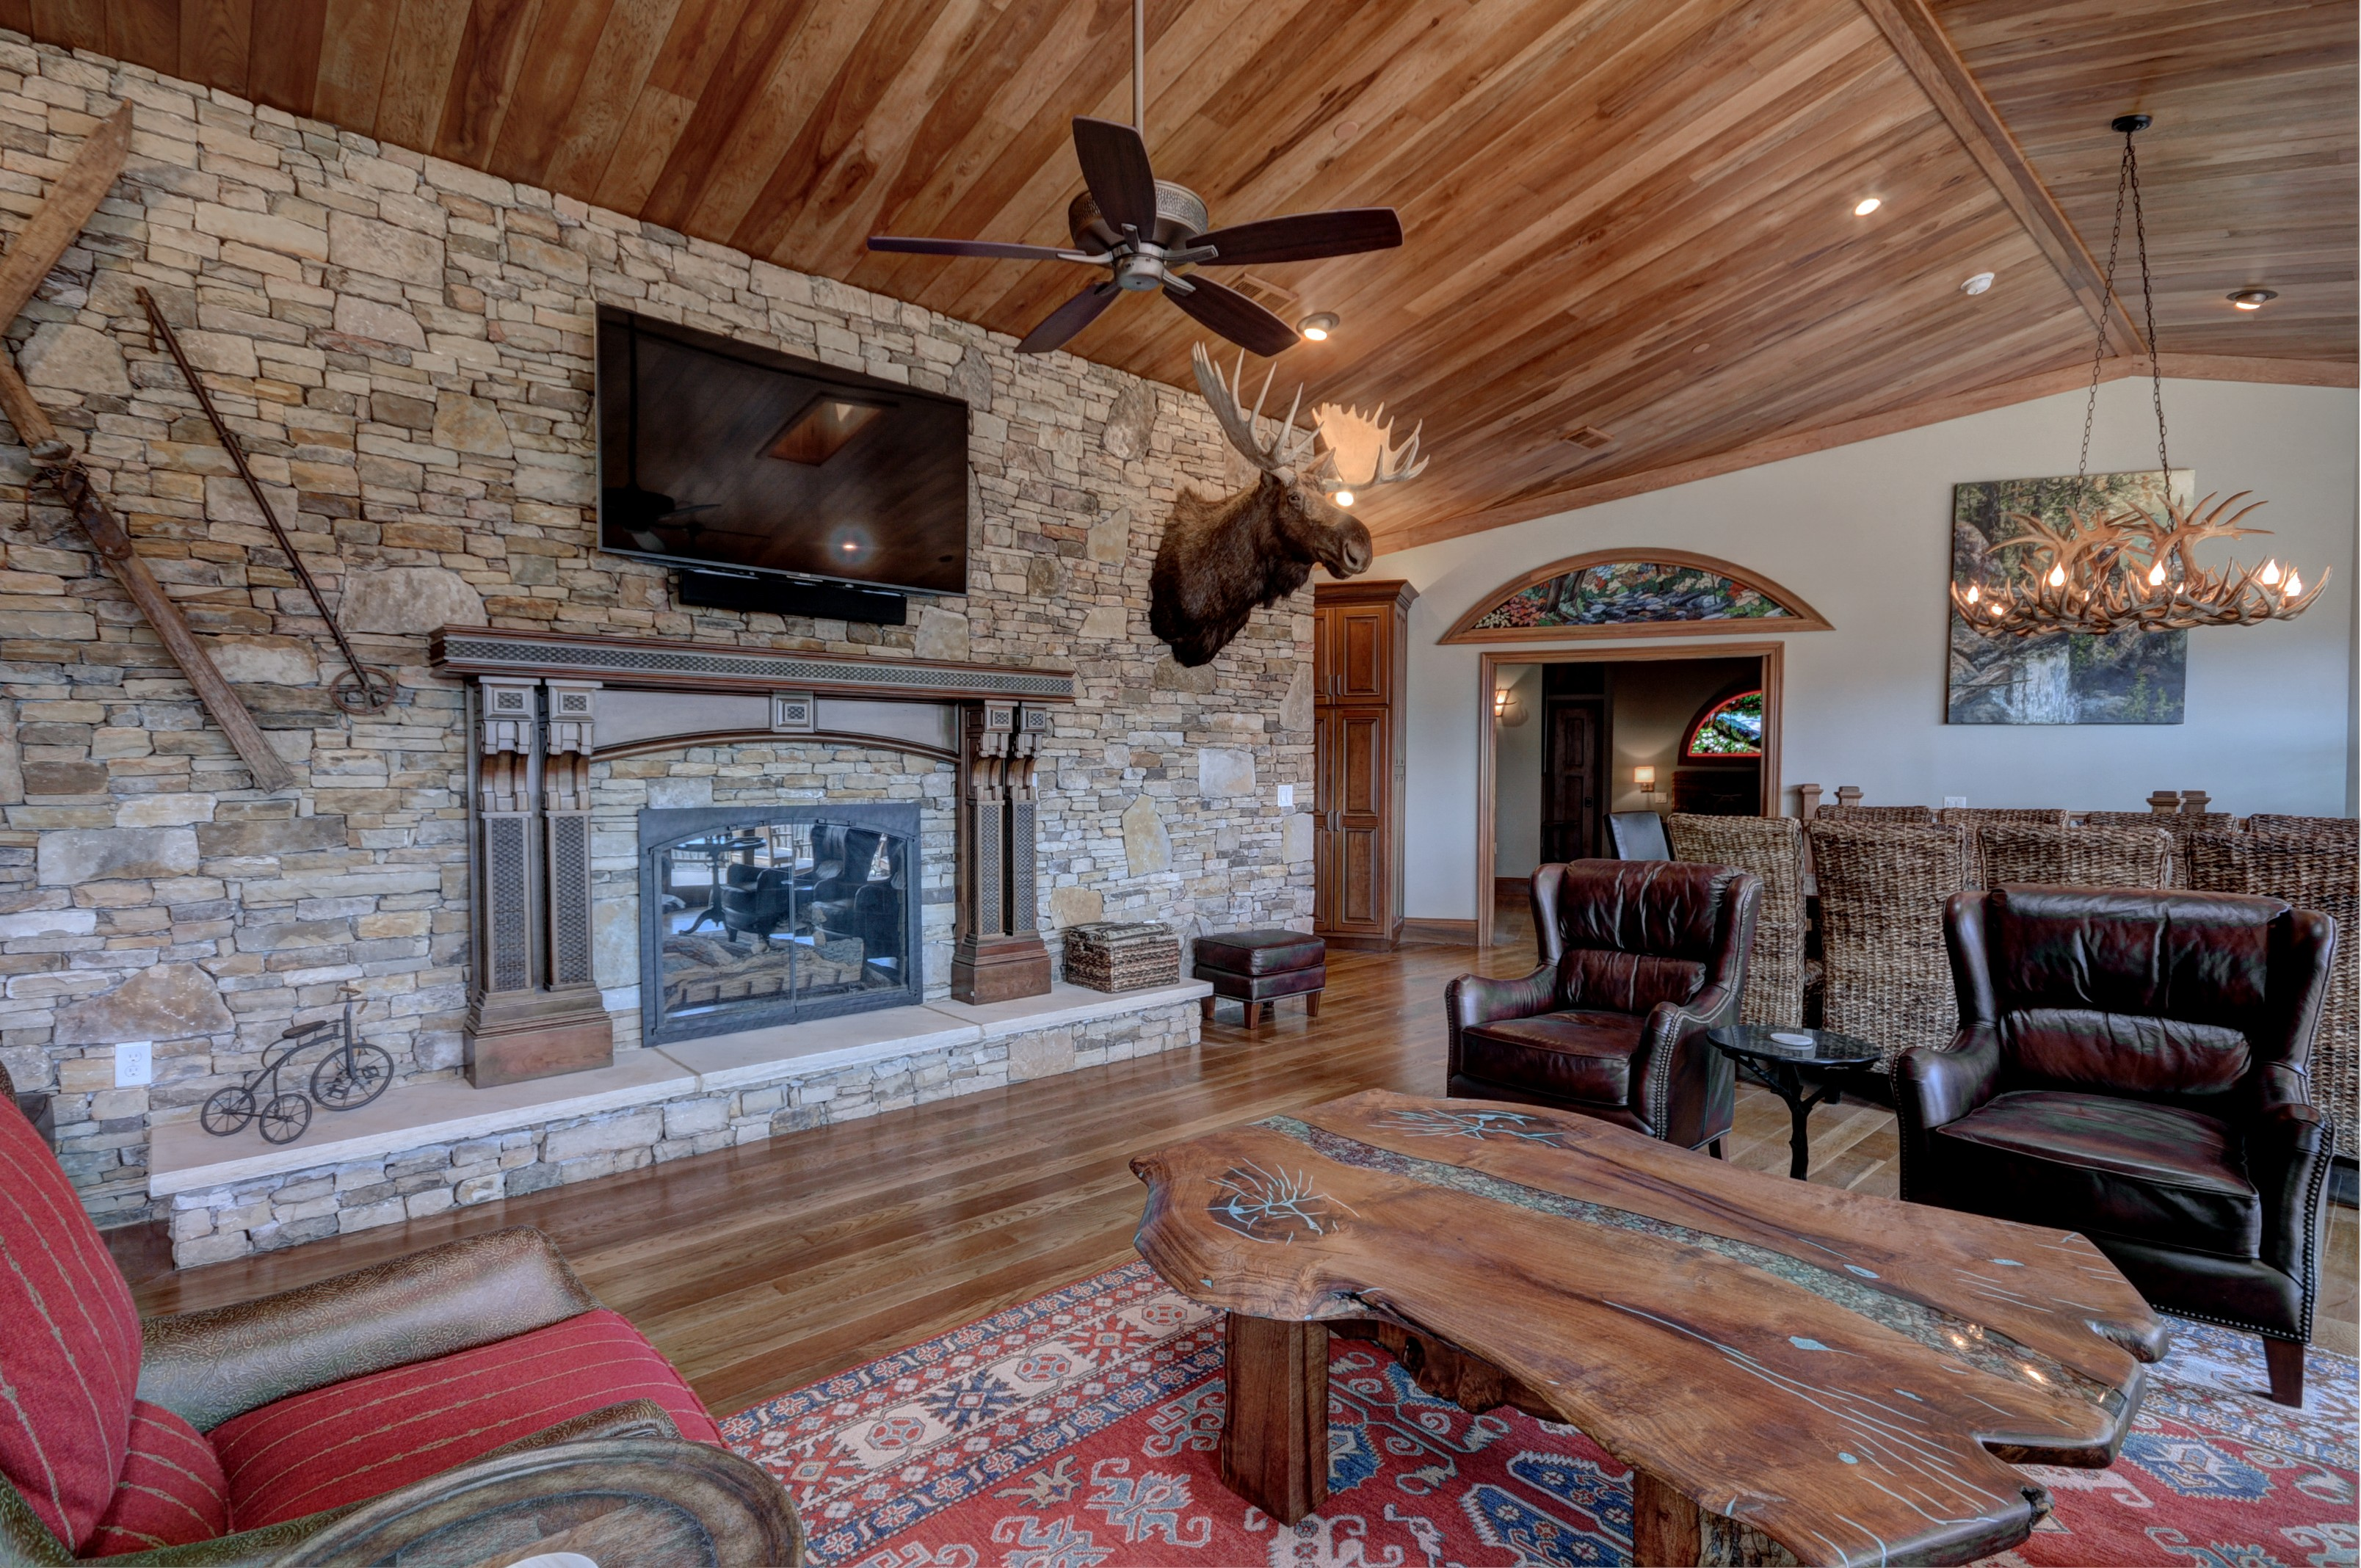 Luxury vacation home rustic elegance lodge gatlinburg for Rustic elegant living room